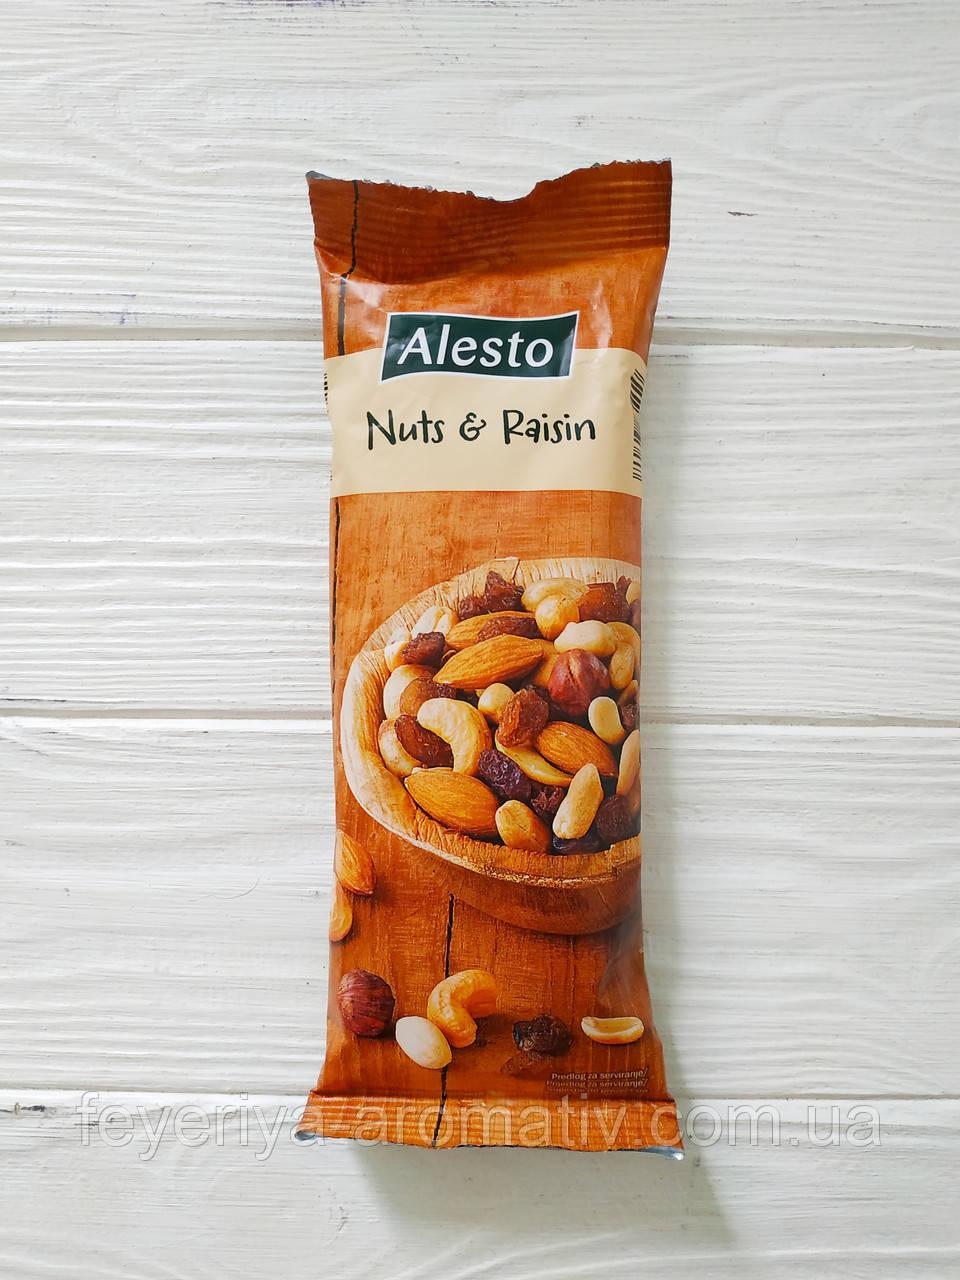 Смесь изюма с орехами Alesto Nuts&Raisin 100гр (Италия)